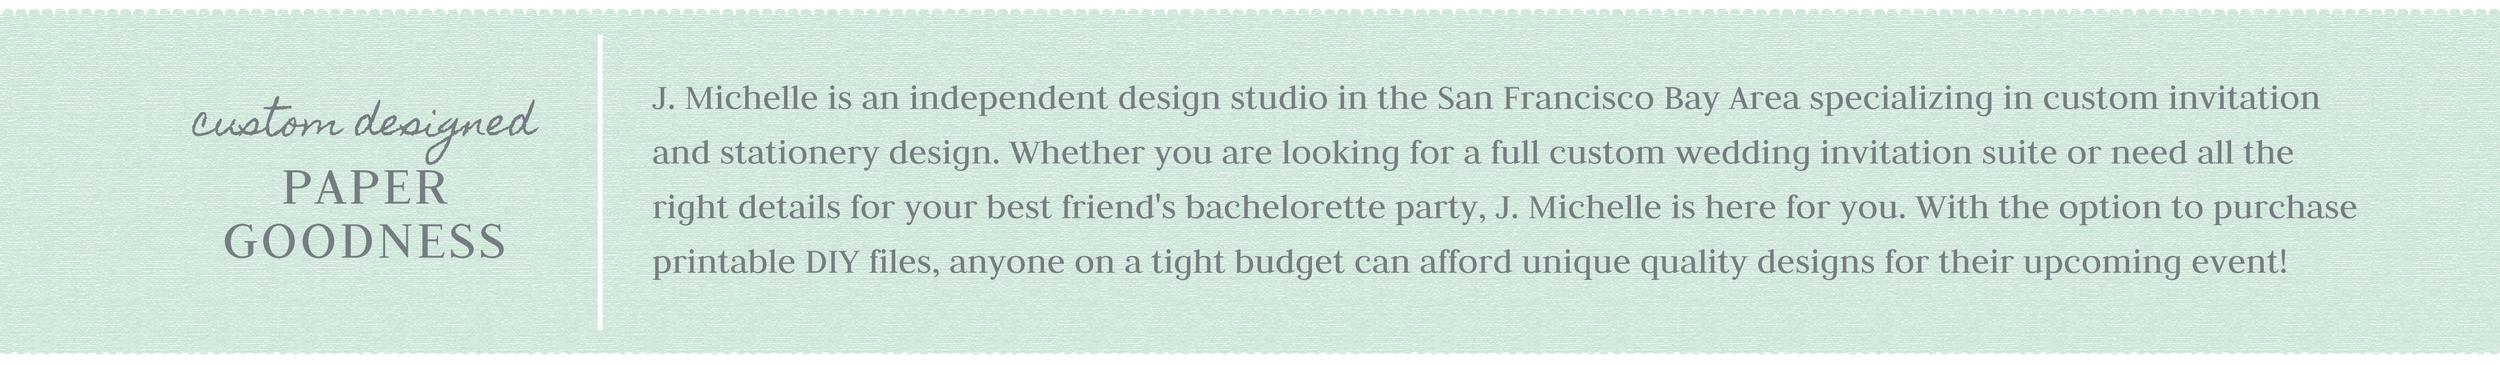 J. Michelle Studio - paper goodness.jpg